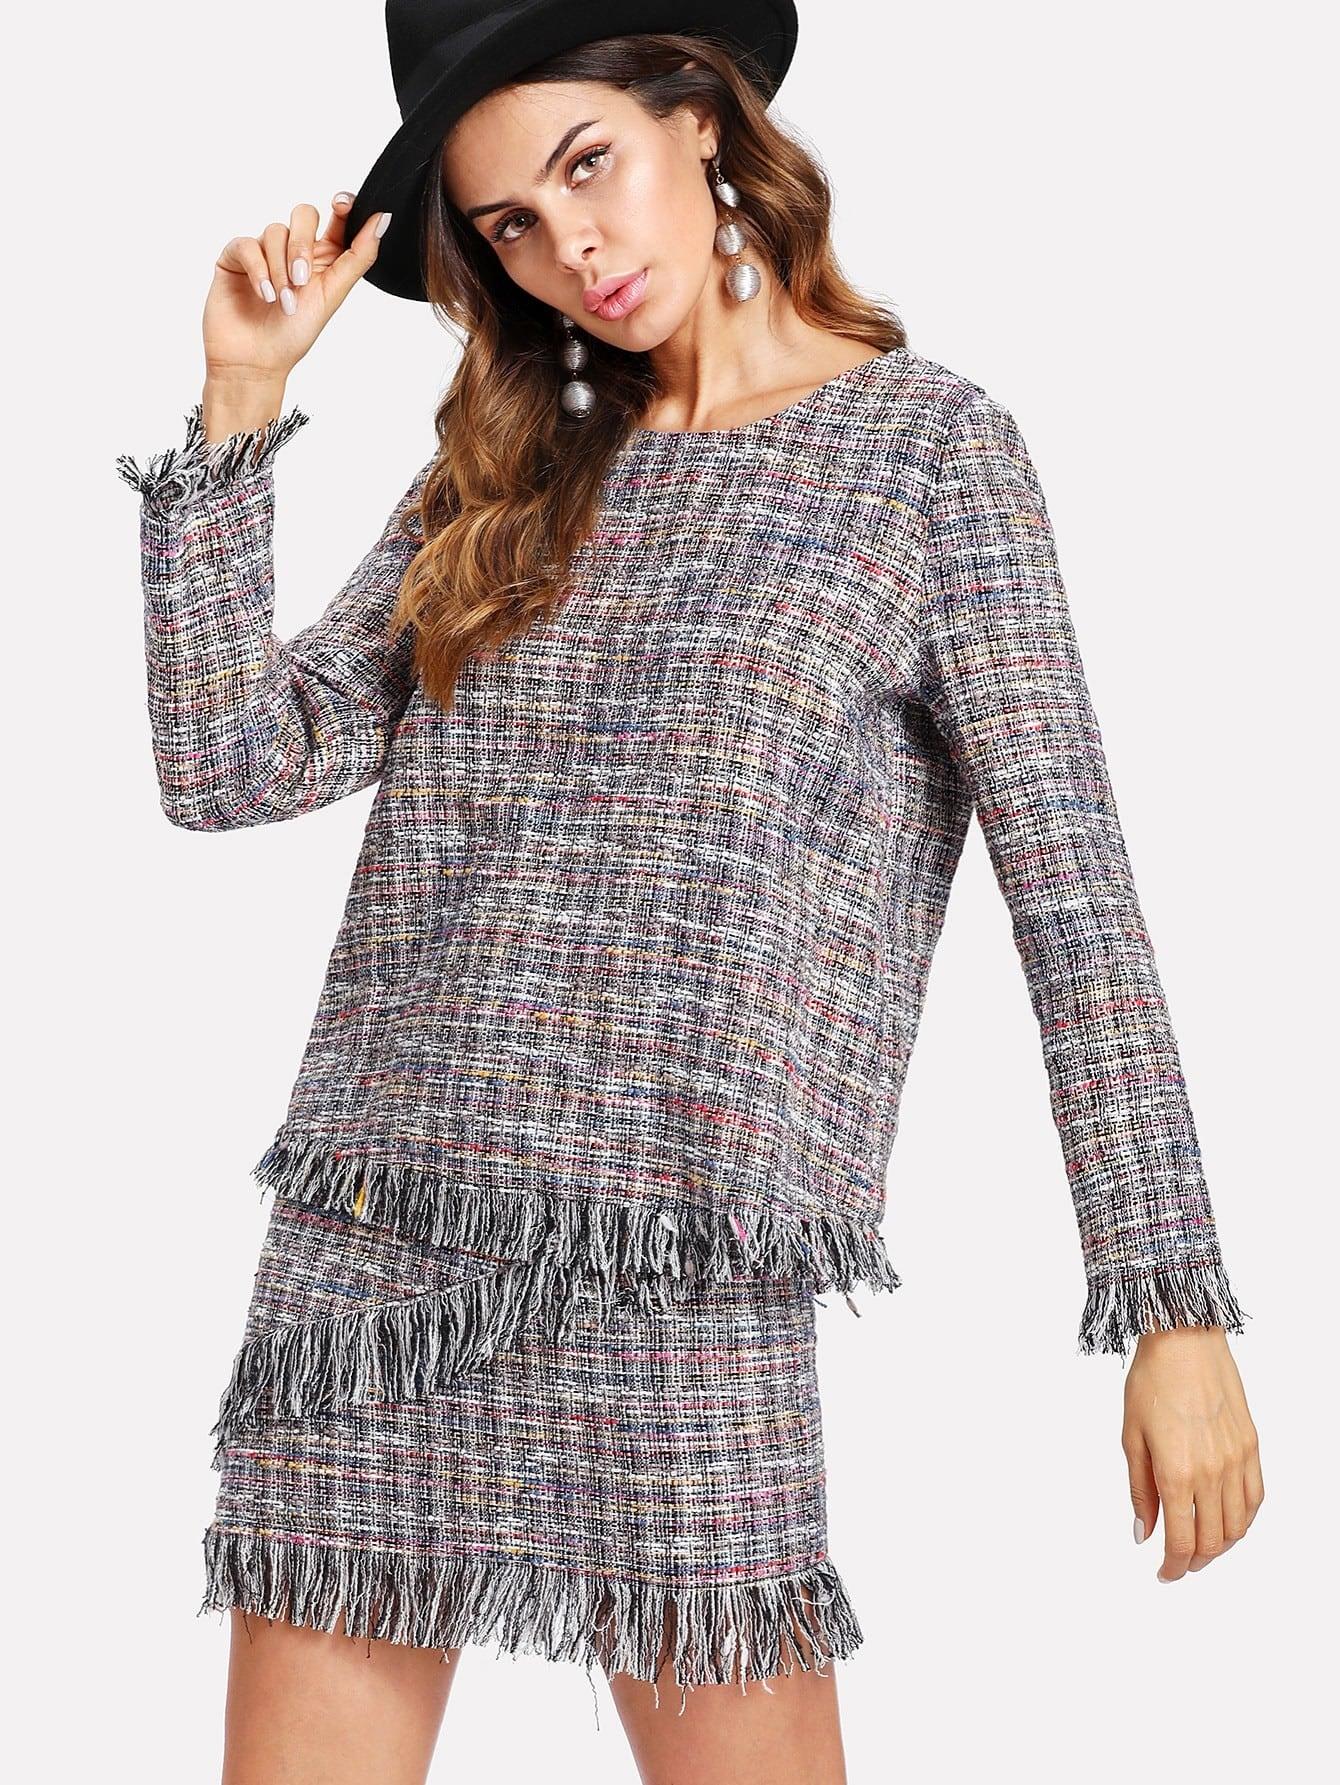 Fringe Trim Tweed Top & Skirt Set lace trim fringe detail tweed top